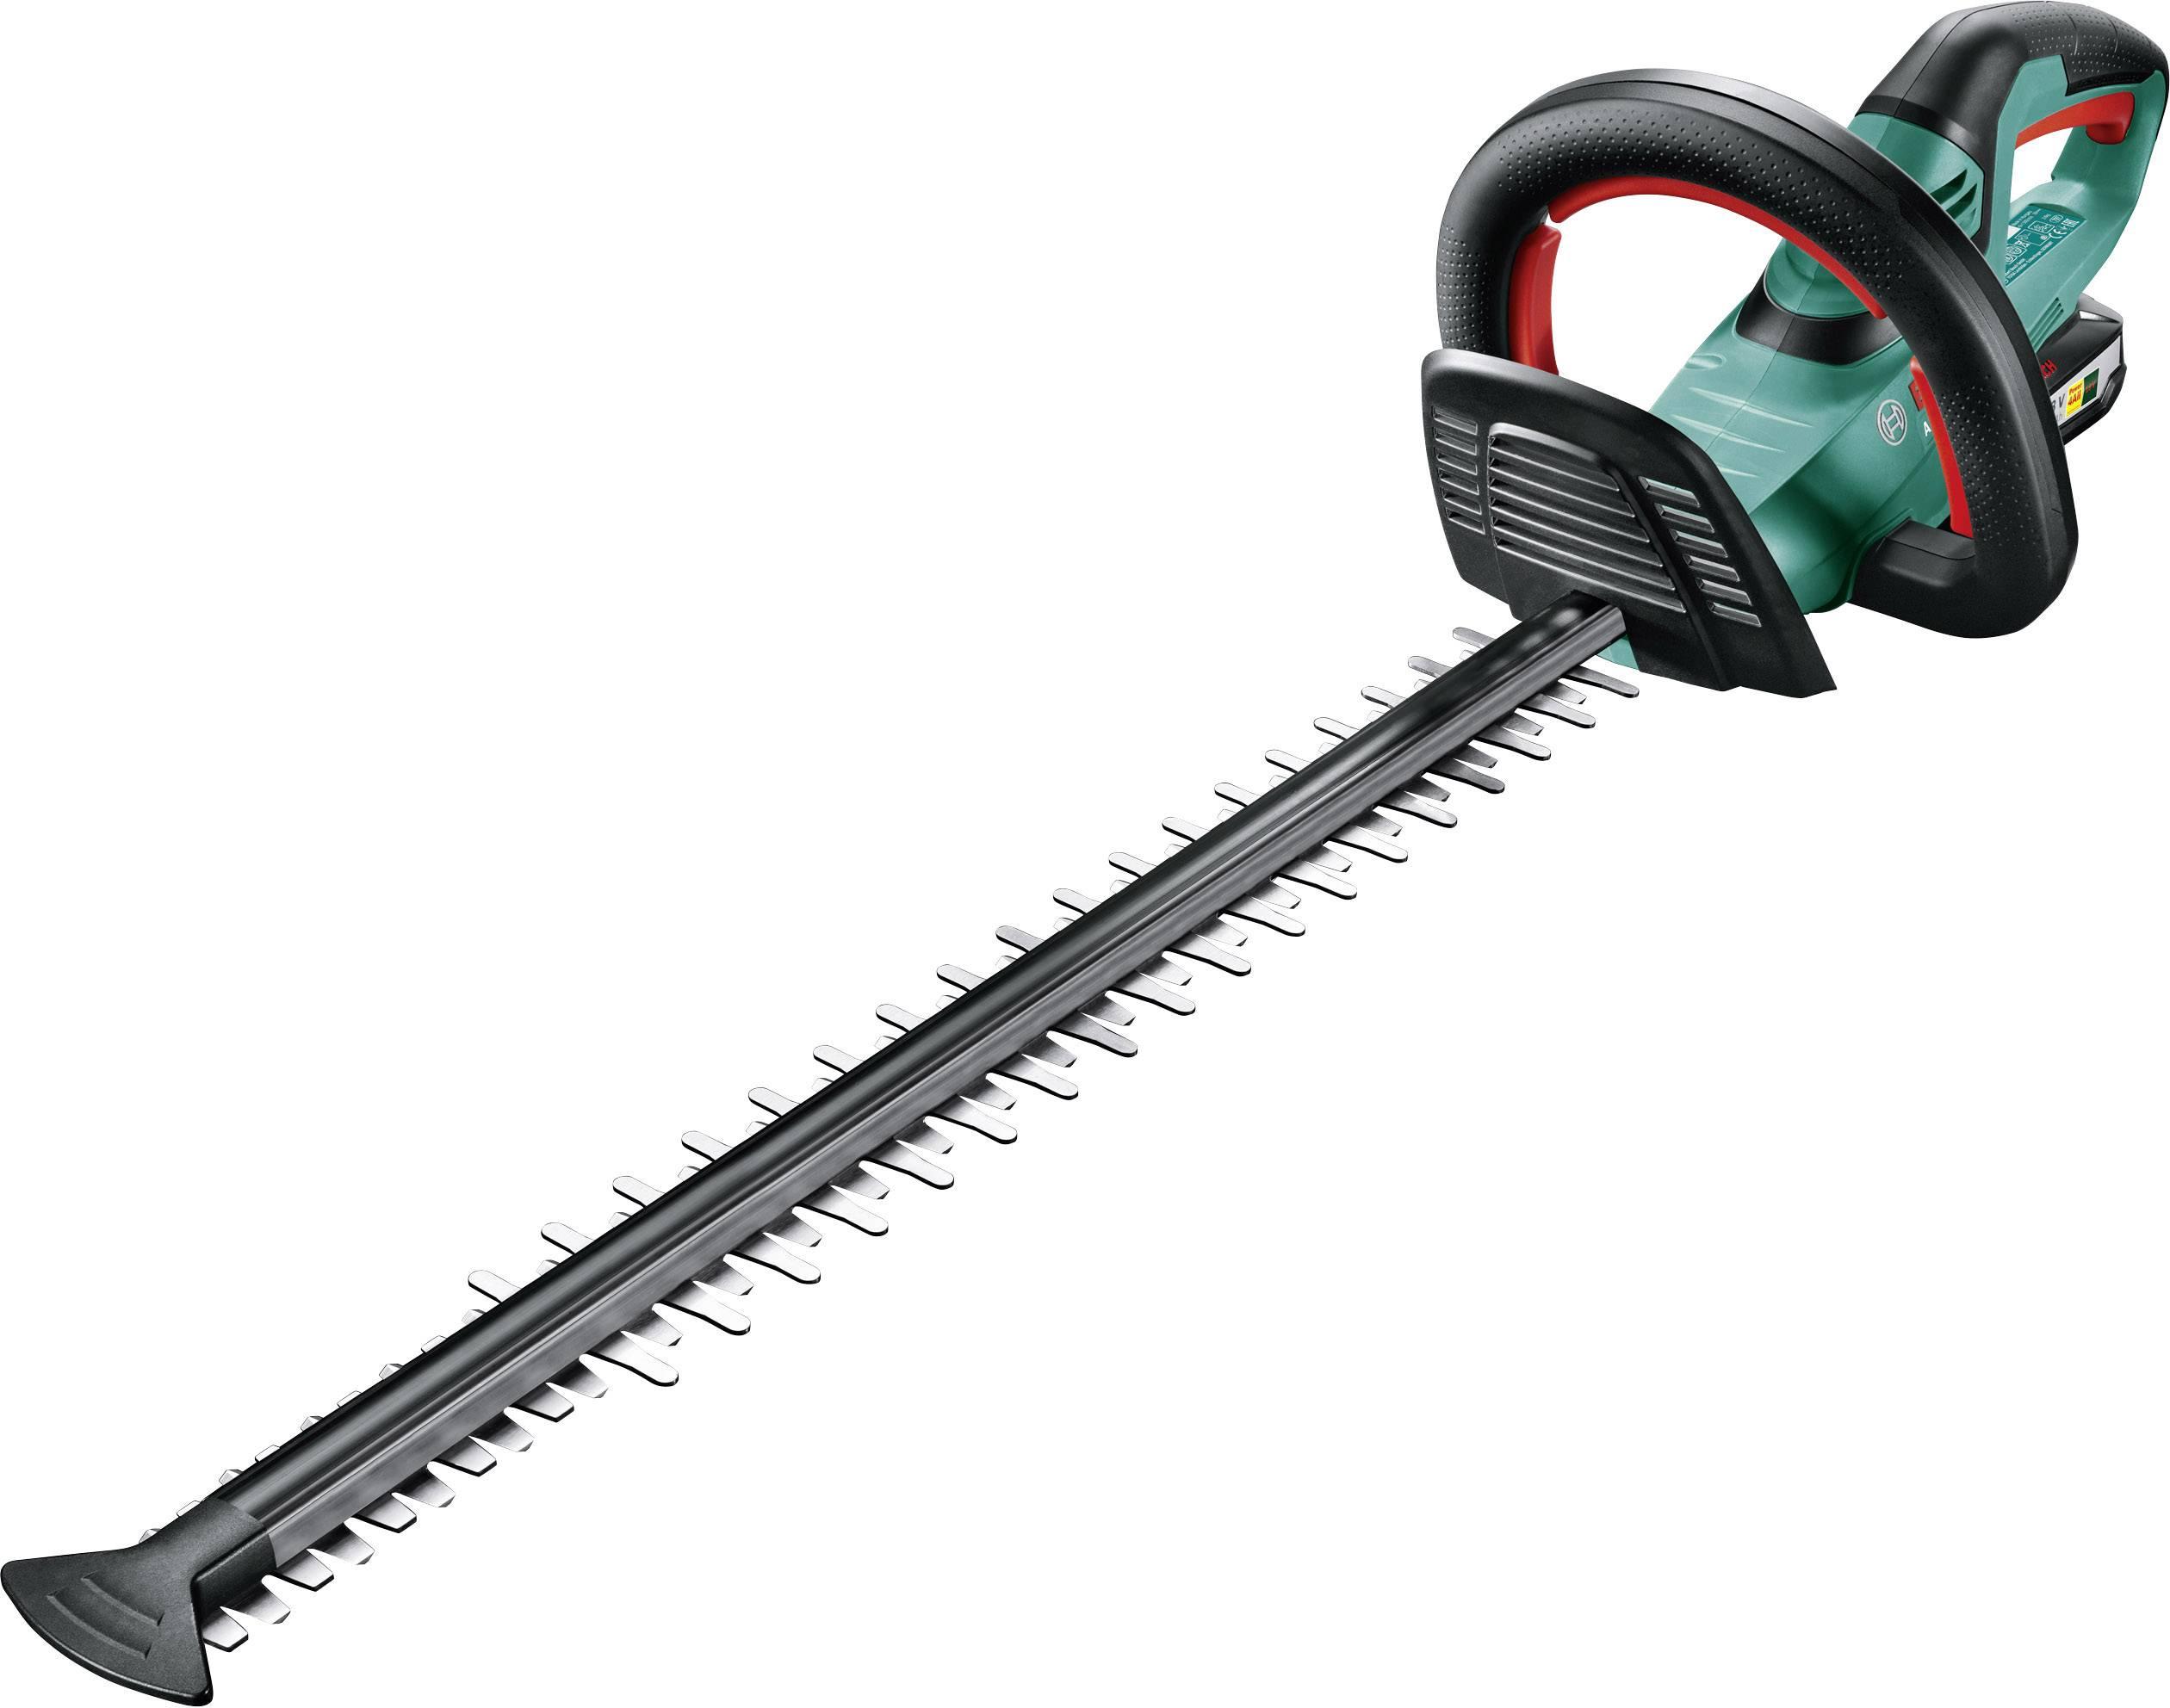 Nůžky na živý plot Bosch Home and Garden AHS 55-20 LI 0600849G00, Li-Ion akumulátor